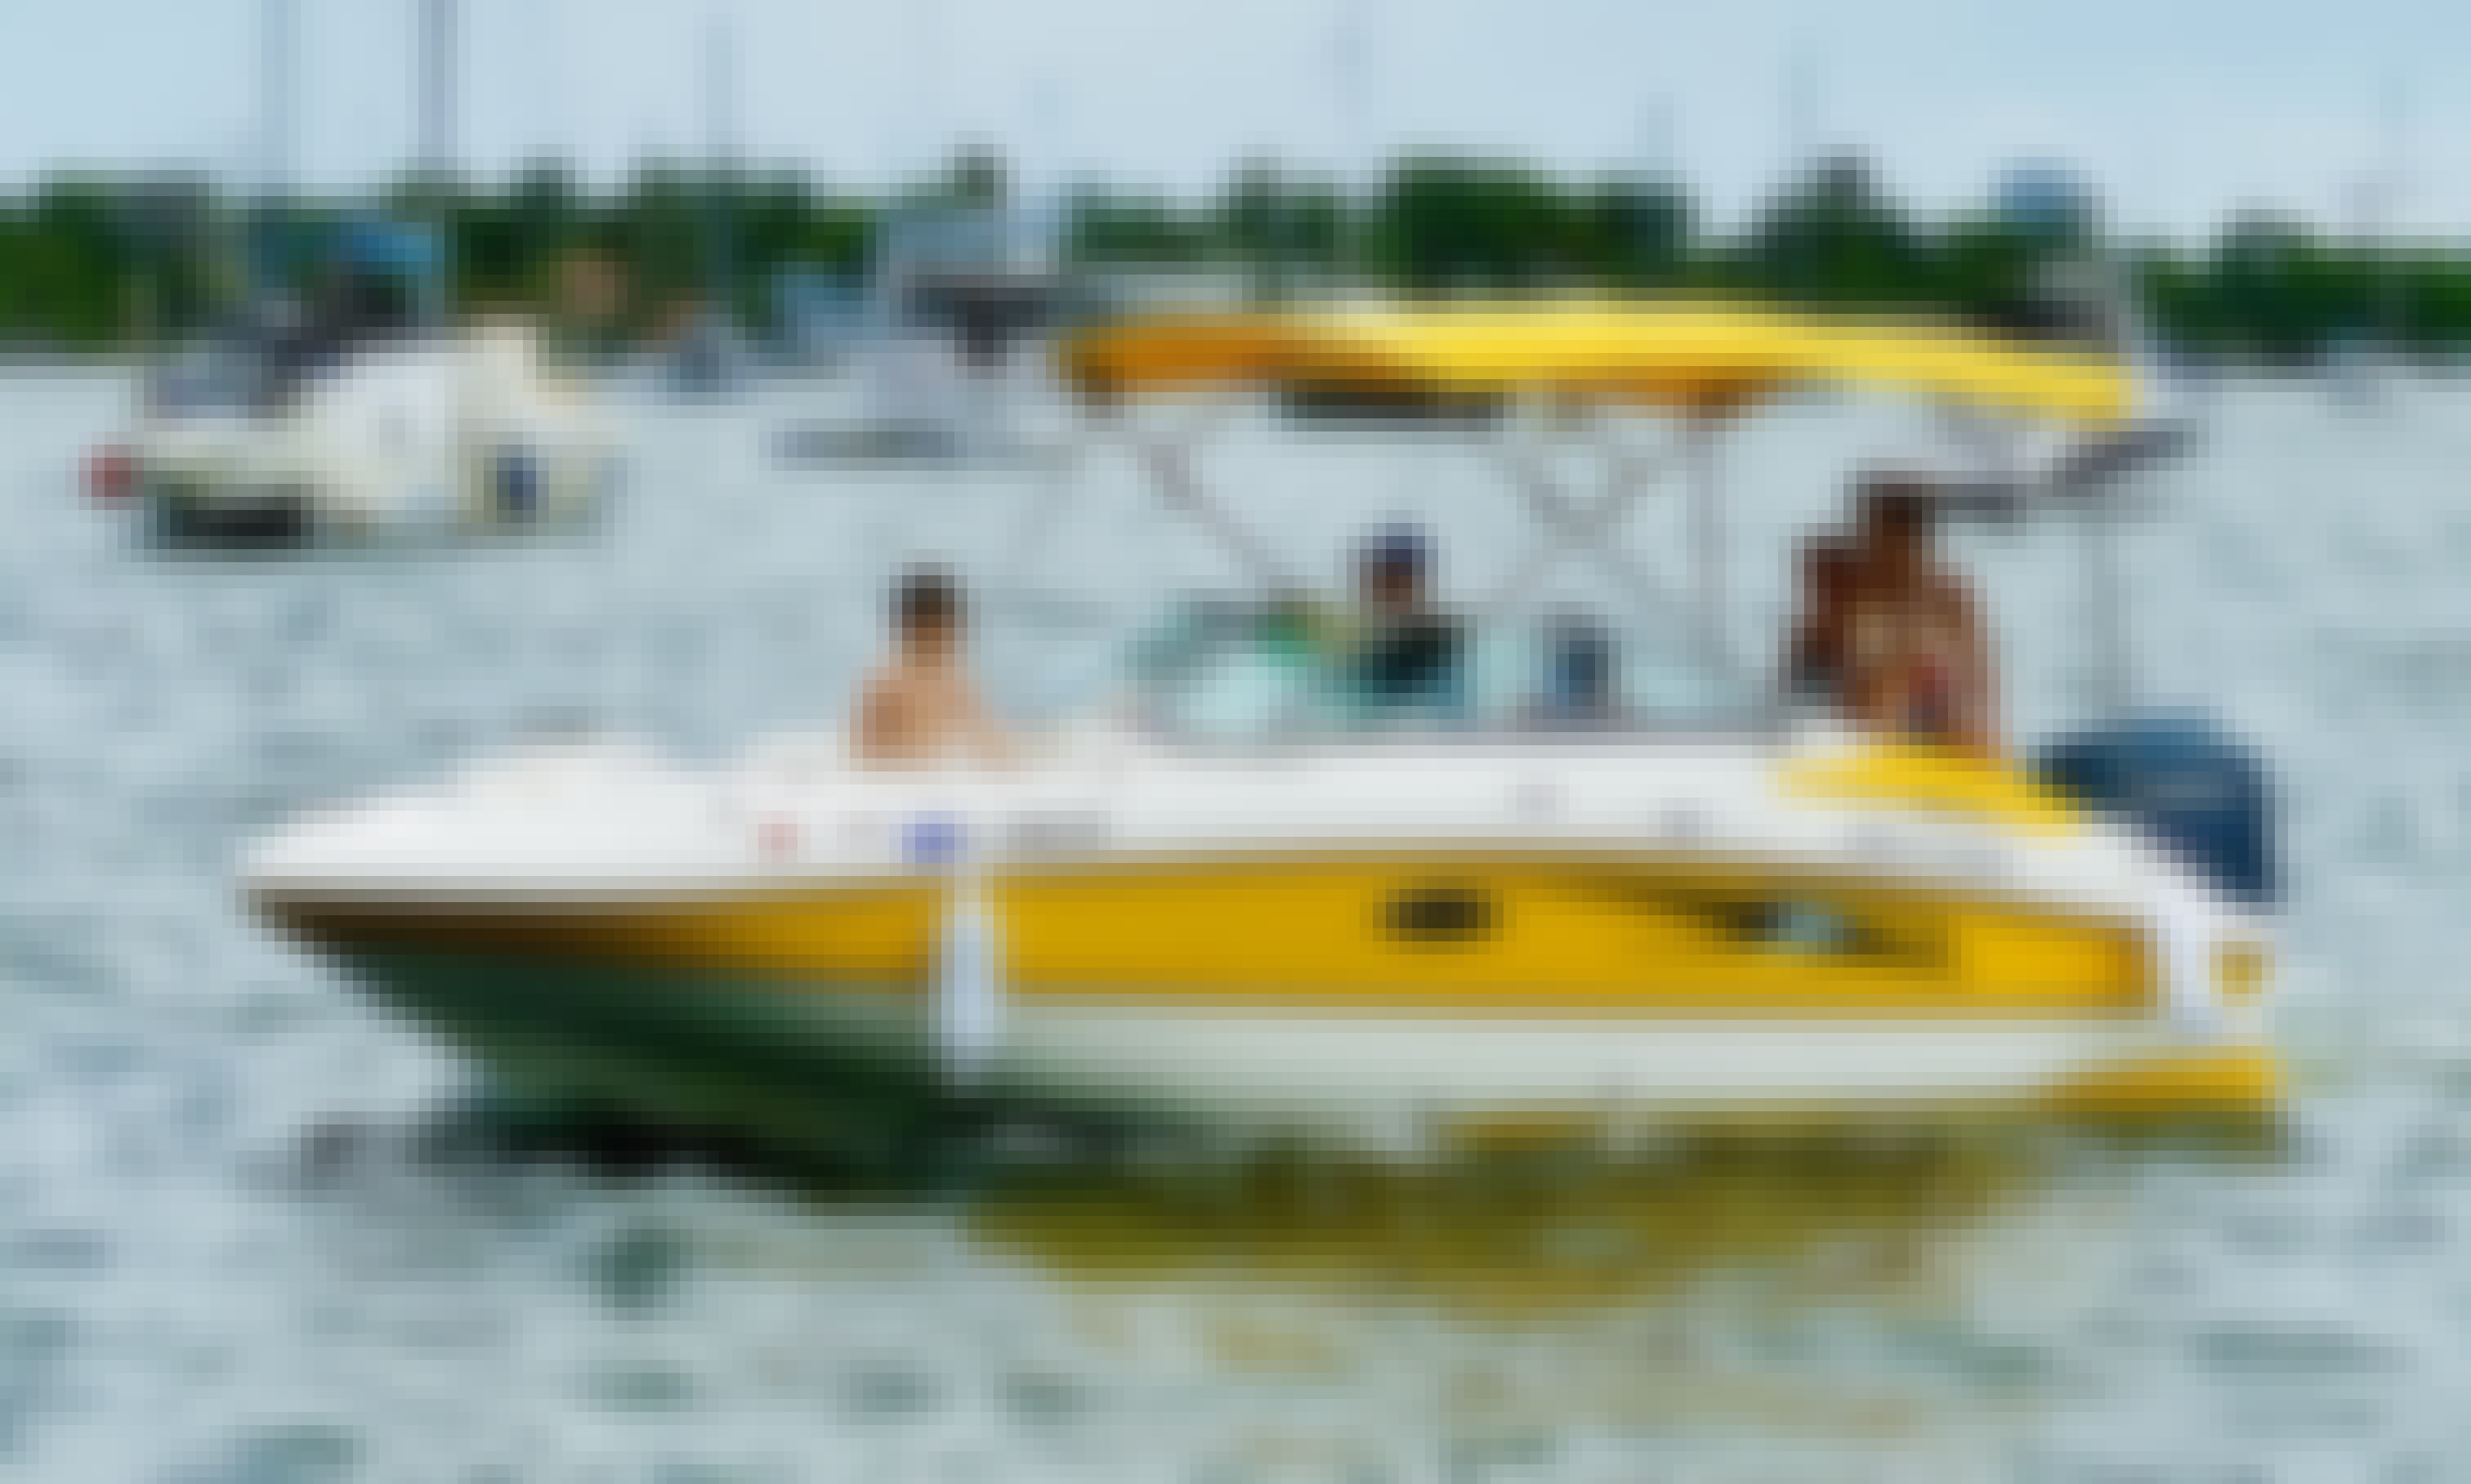 Hurricane 20ft Boat Rental in Hollywood, Florida